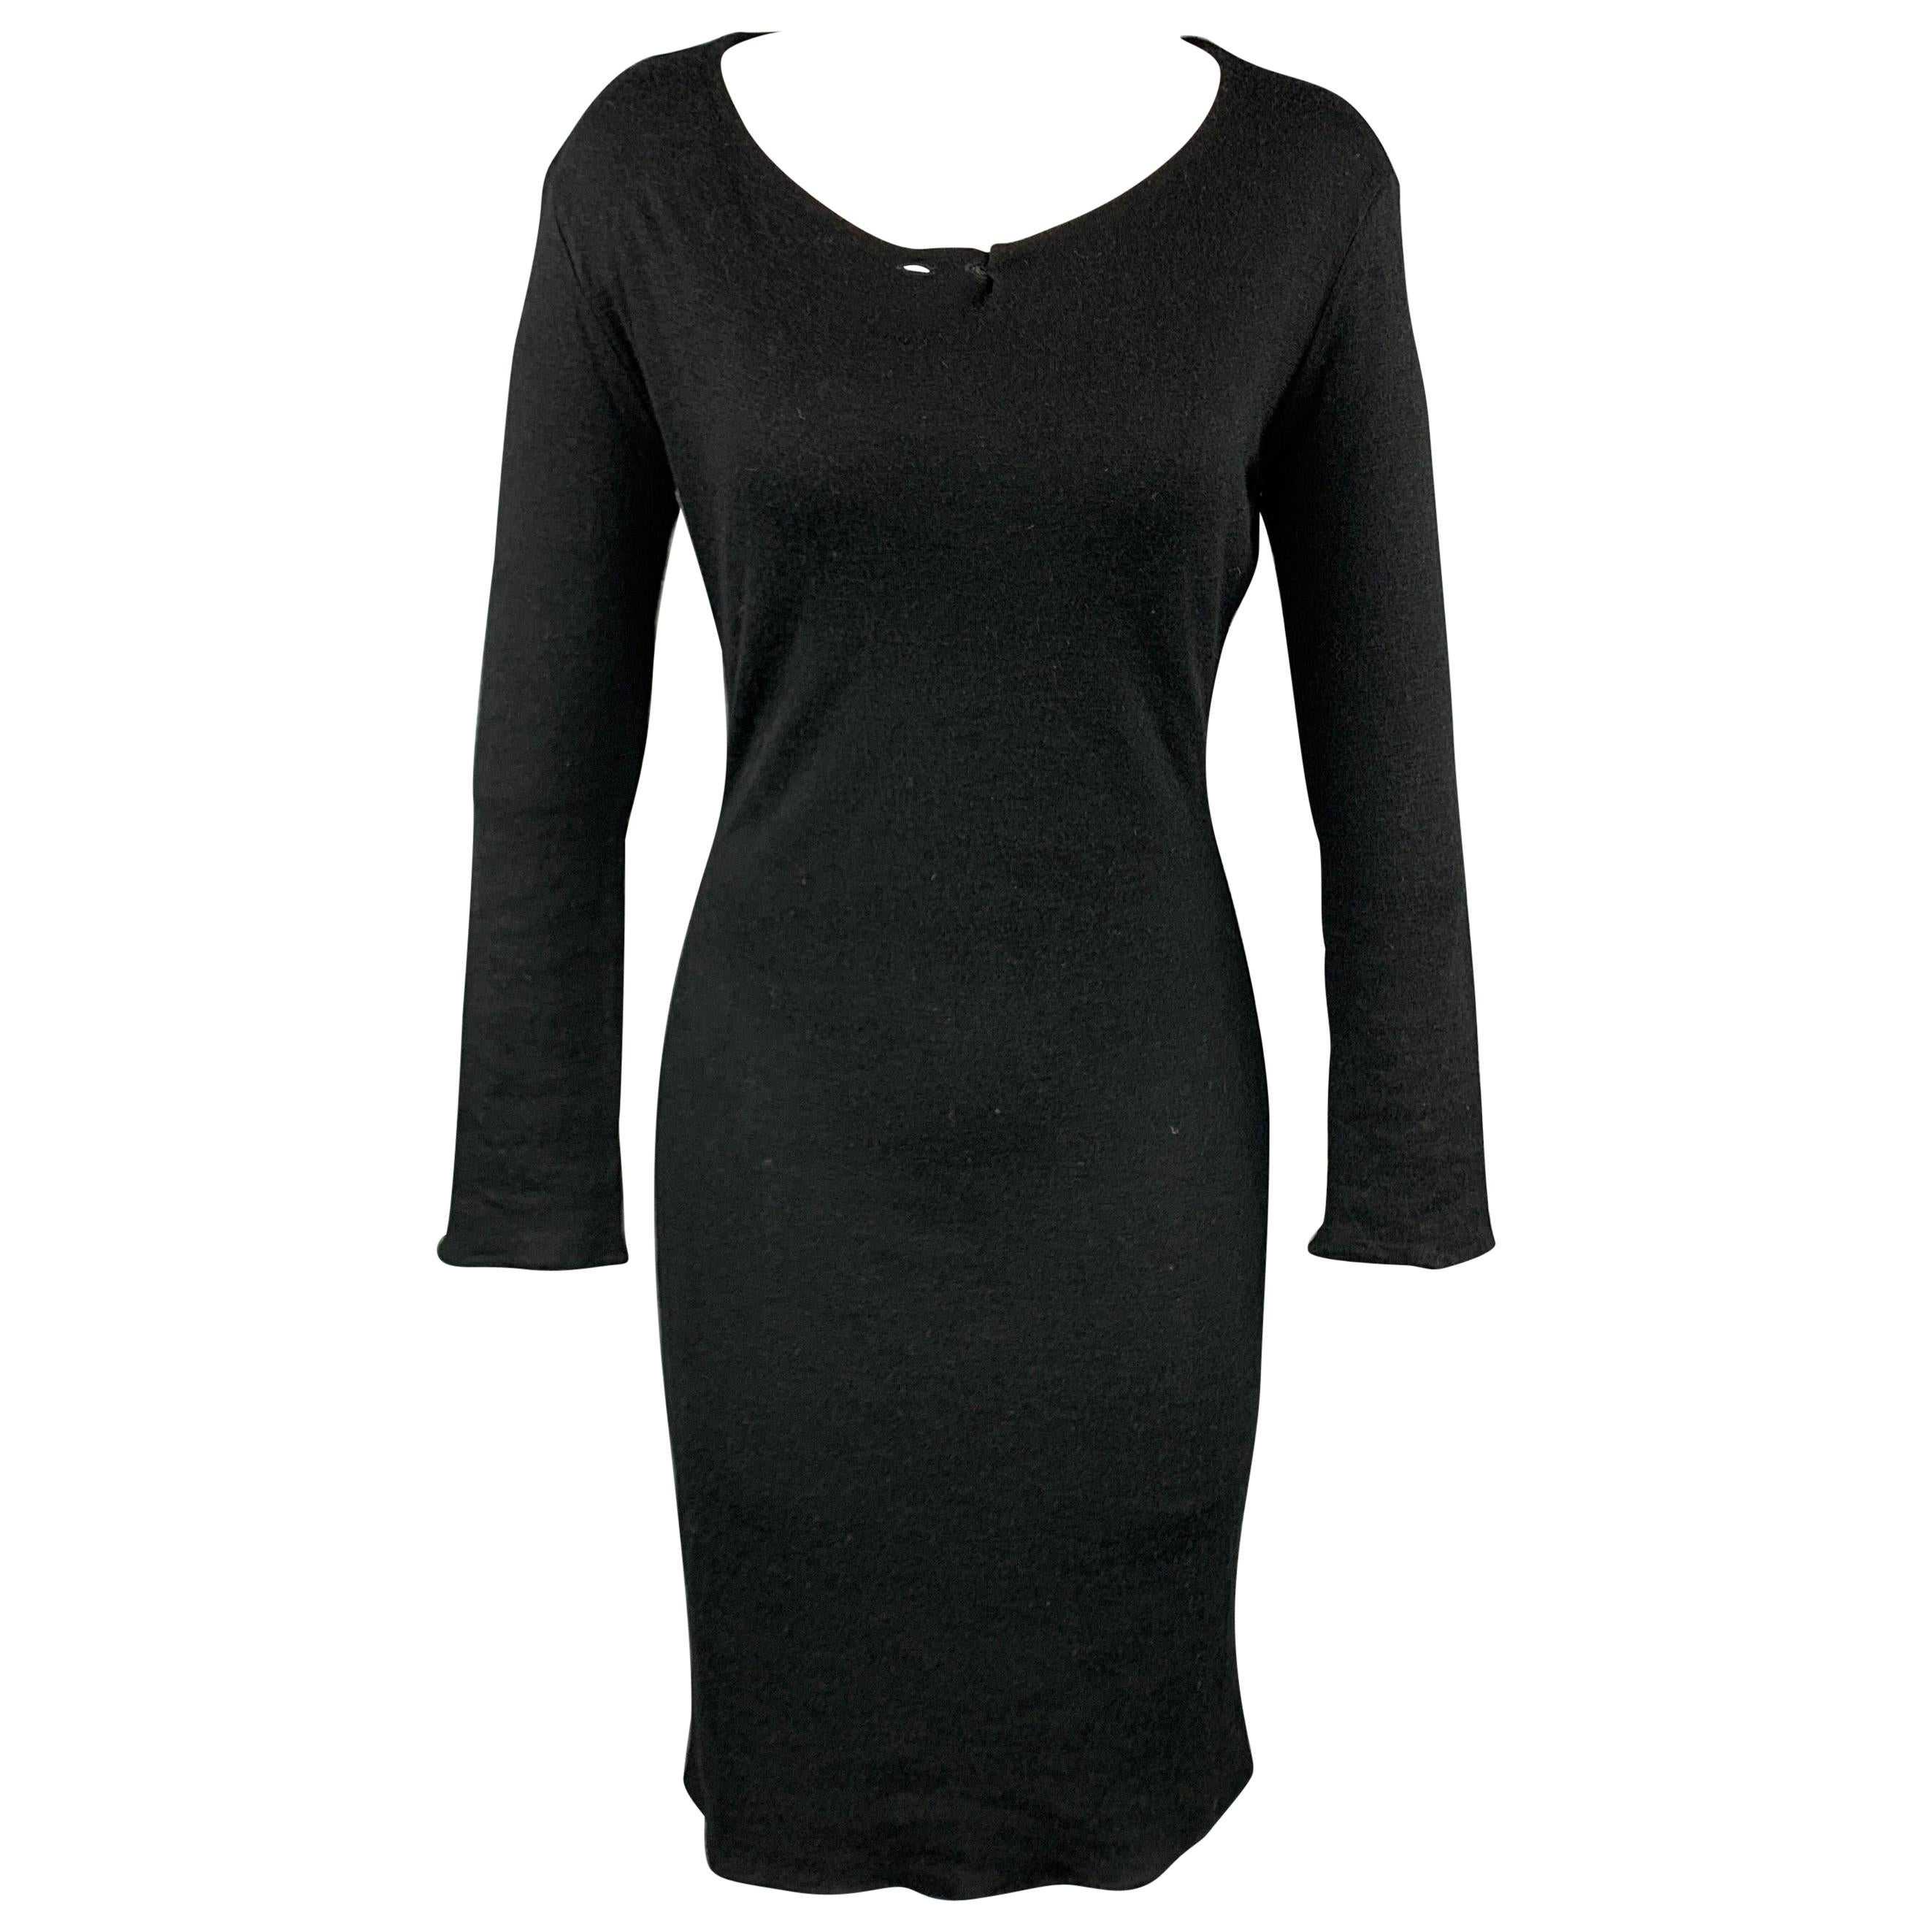 MAISON MARTIN MARGIELA Size S Black Viscose / Wool Sweater Dress